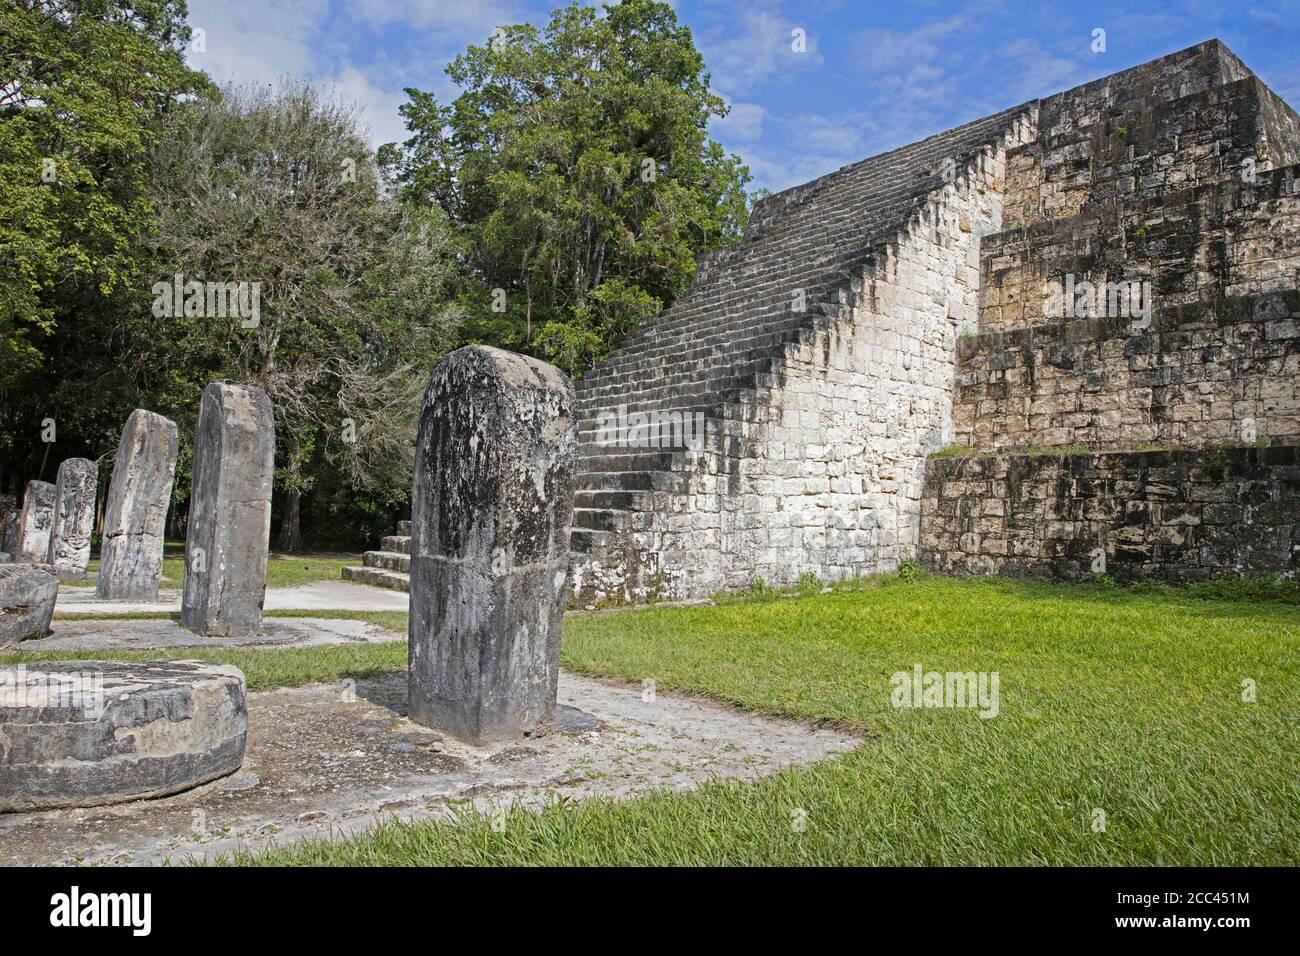 Old ruins of Tikal / Yax Mutal, ancient Maya city near the town Flores, Petén Department, Guatemala, Central America Stock Photo